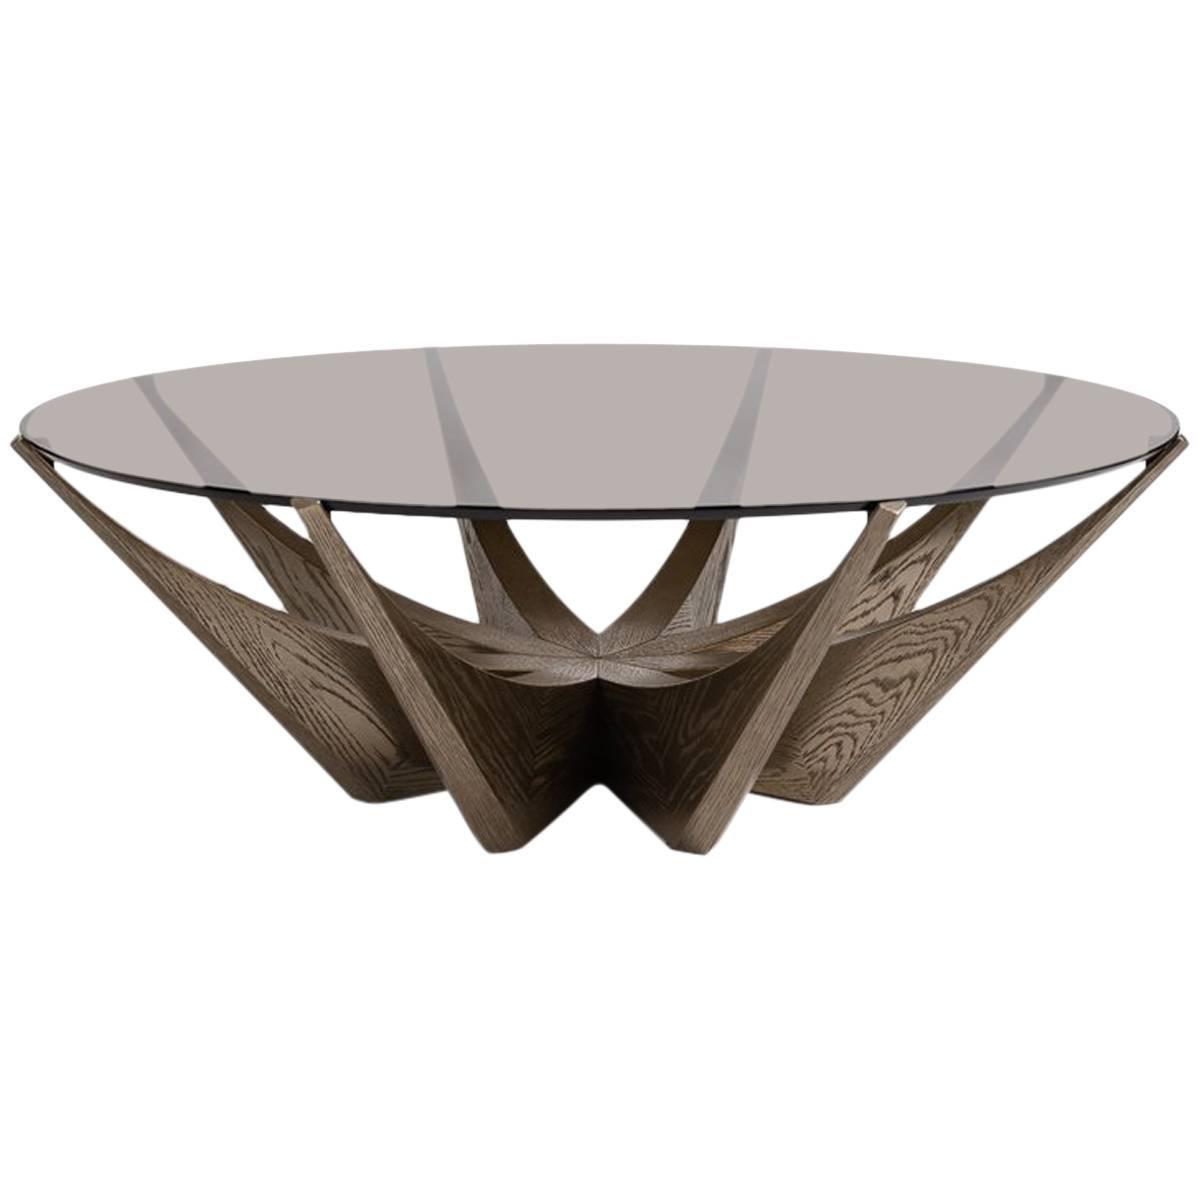 Georgis & Mirgorodsky, 'Whalebone' Custom Coffee Table, USA, 2017